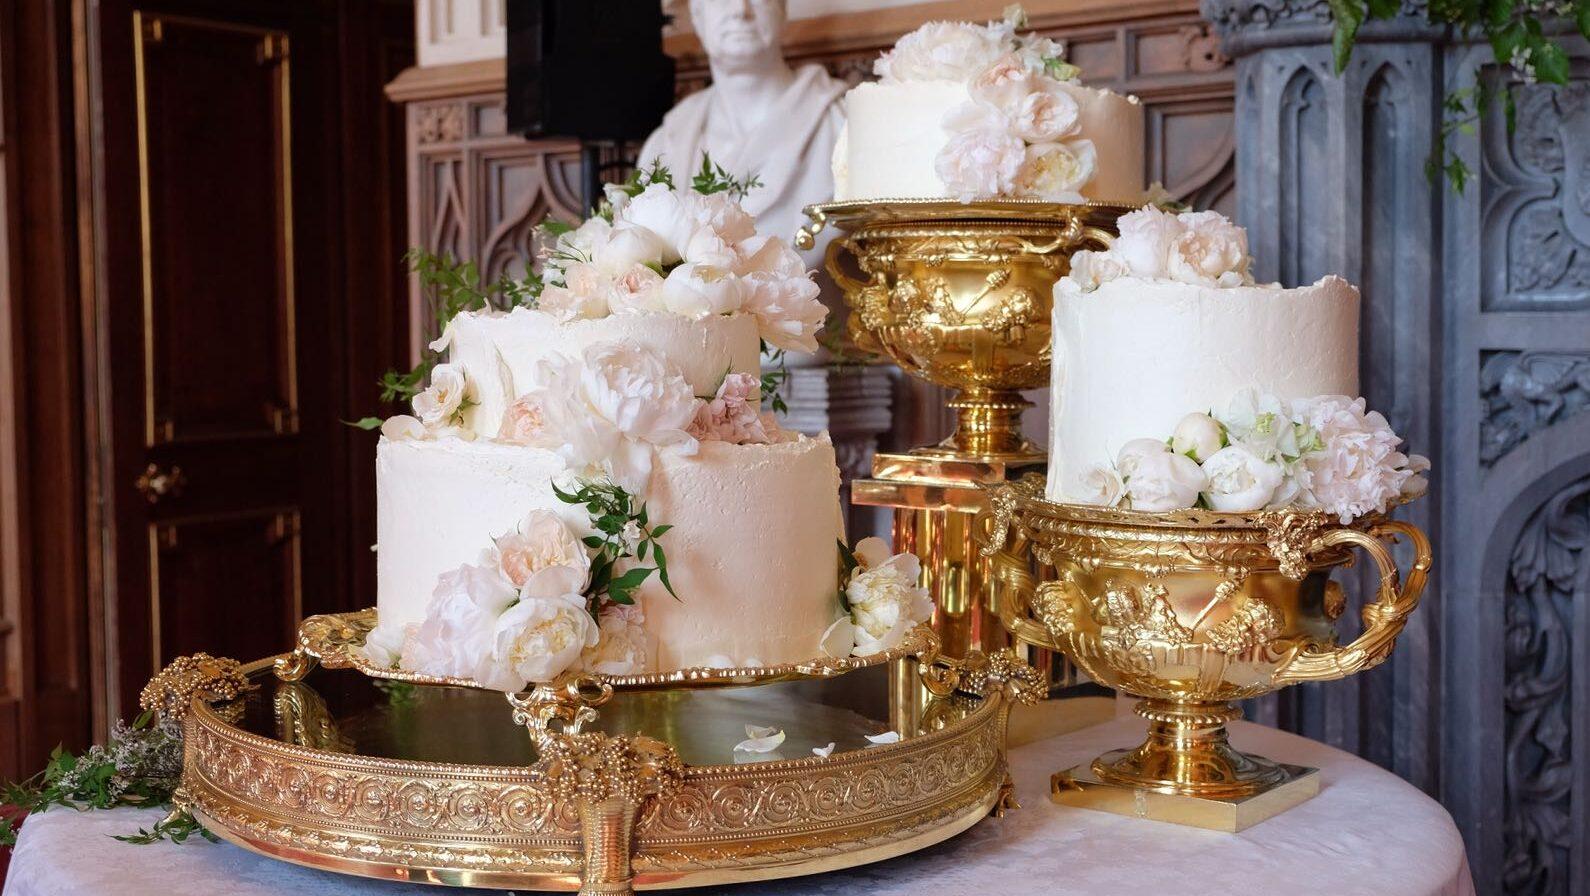 royal-wedding-cake.jpg